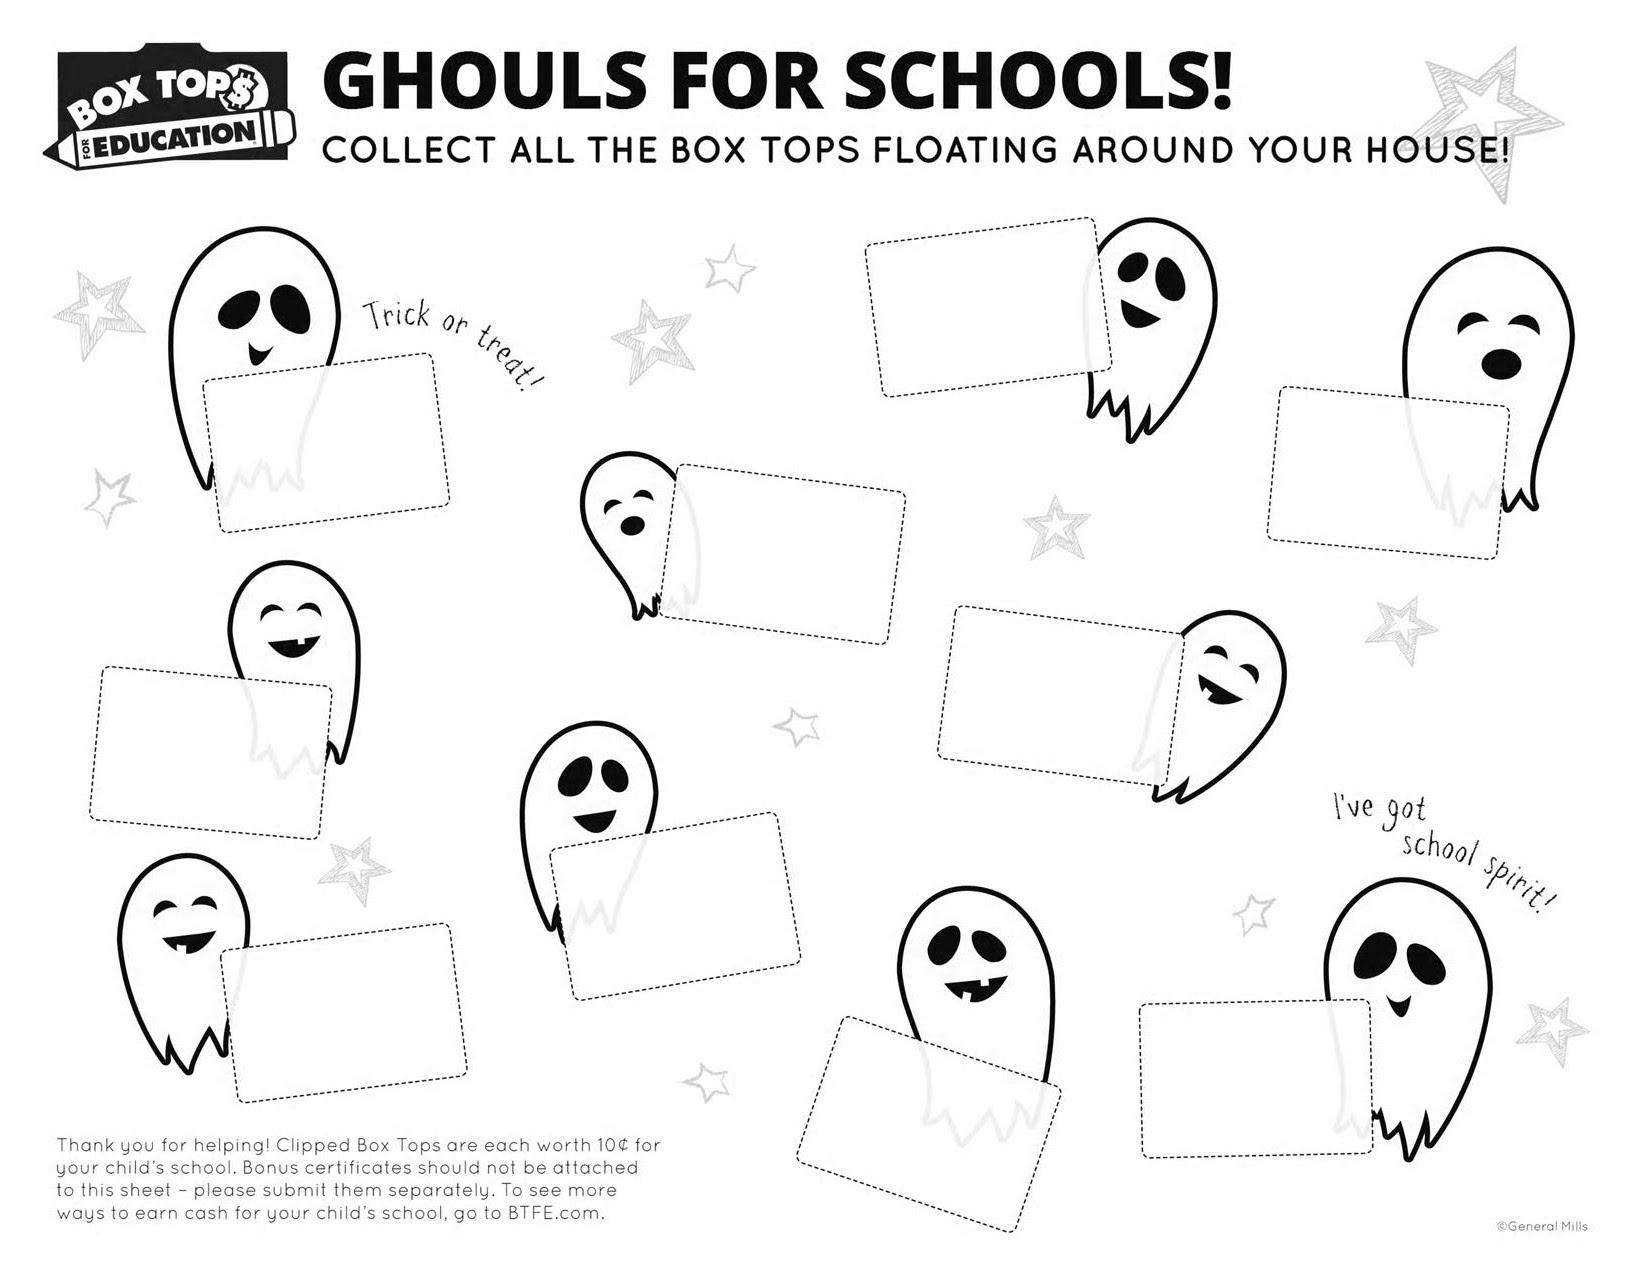 October Boxtop Collection Sheet